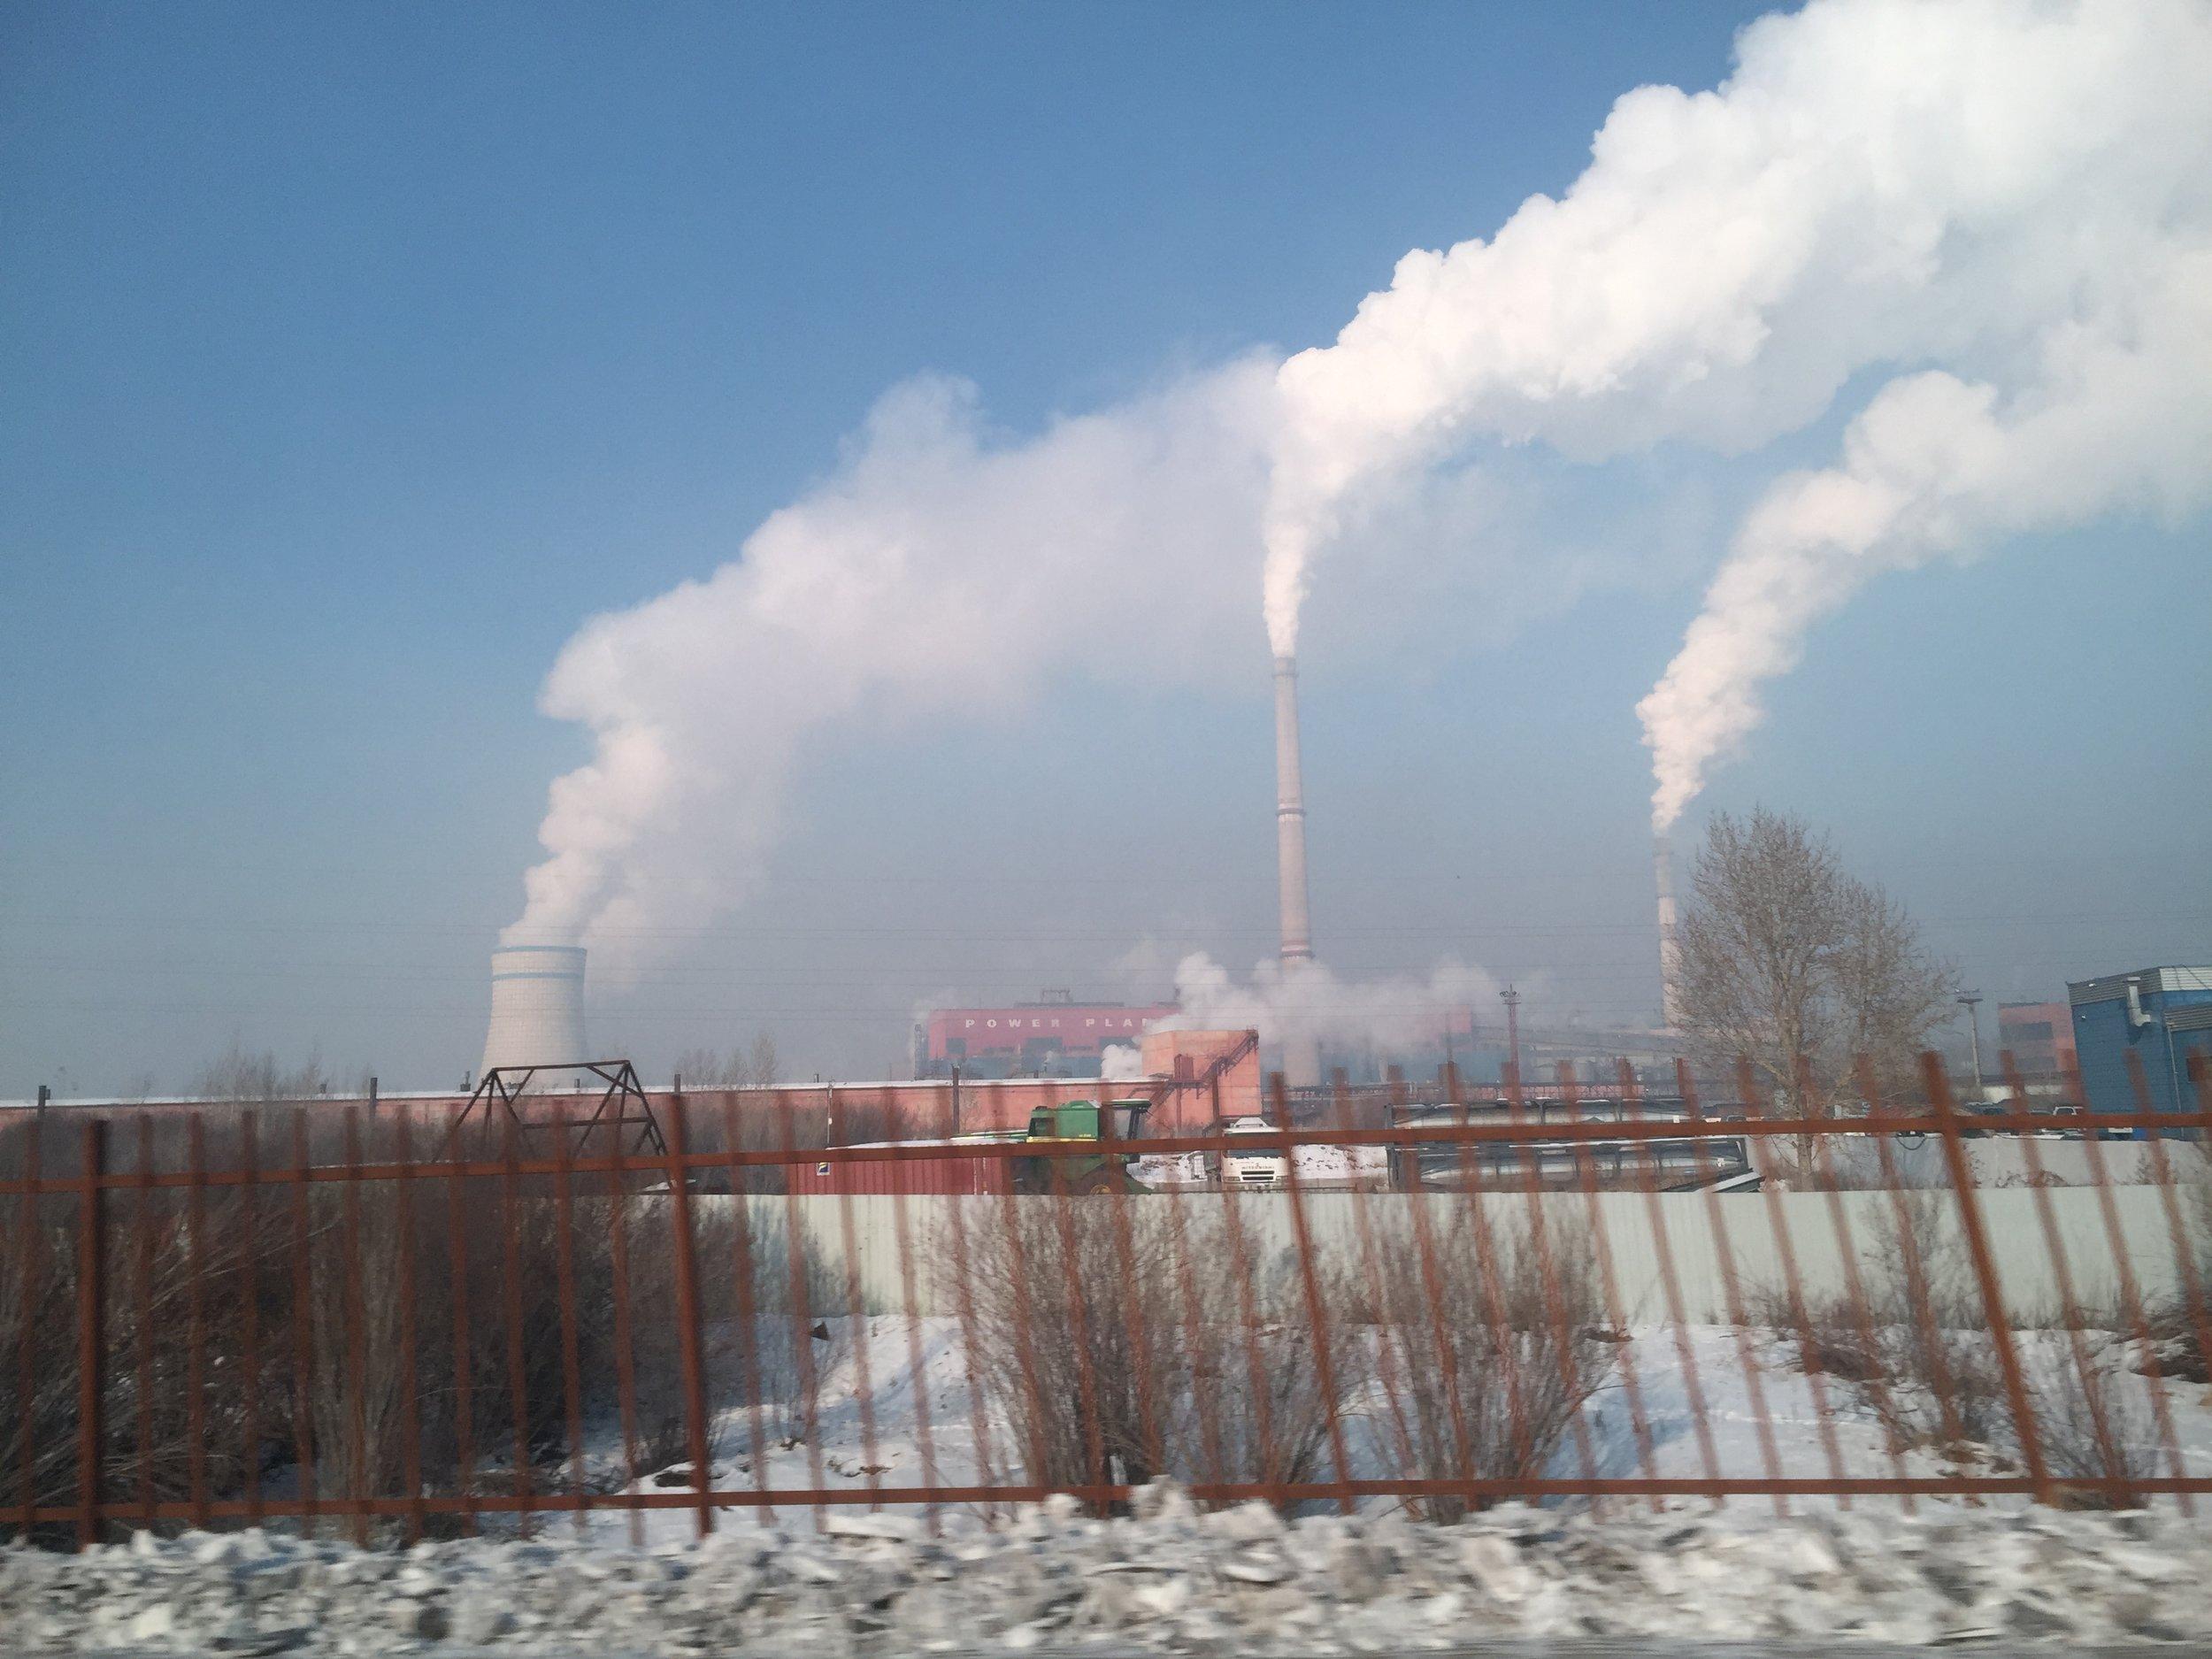 Power plant stacks, Ulaanbaatar, Mongolia - December 2017. Photo by John G. Aronson